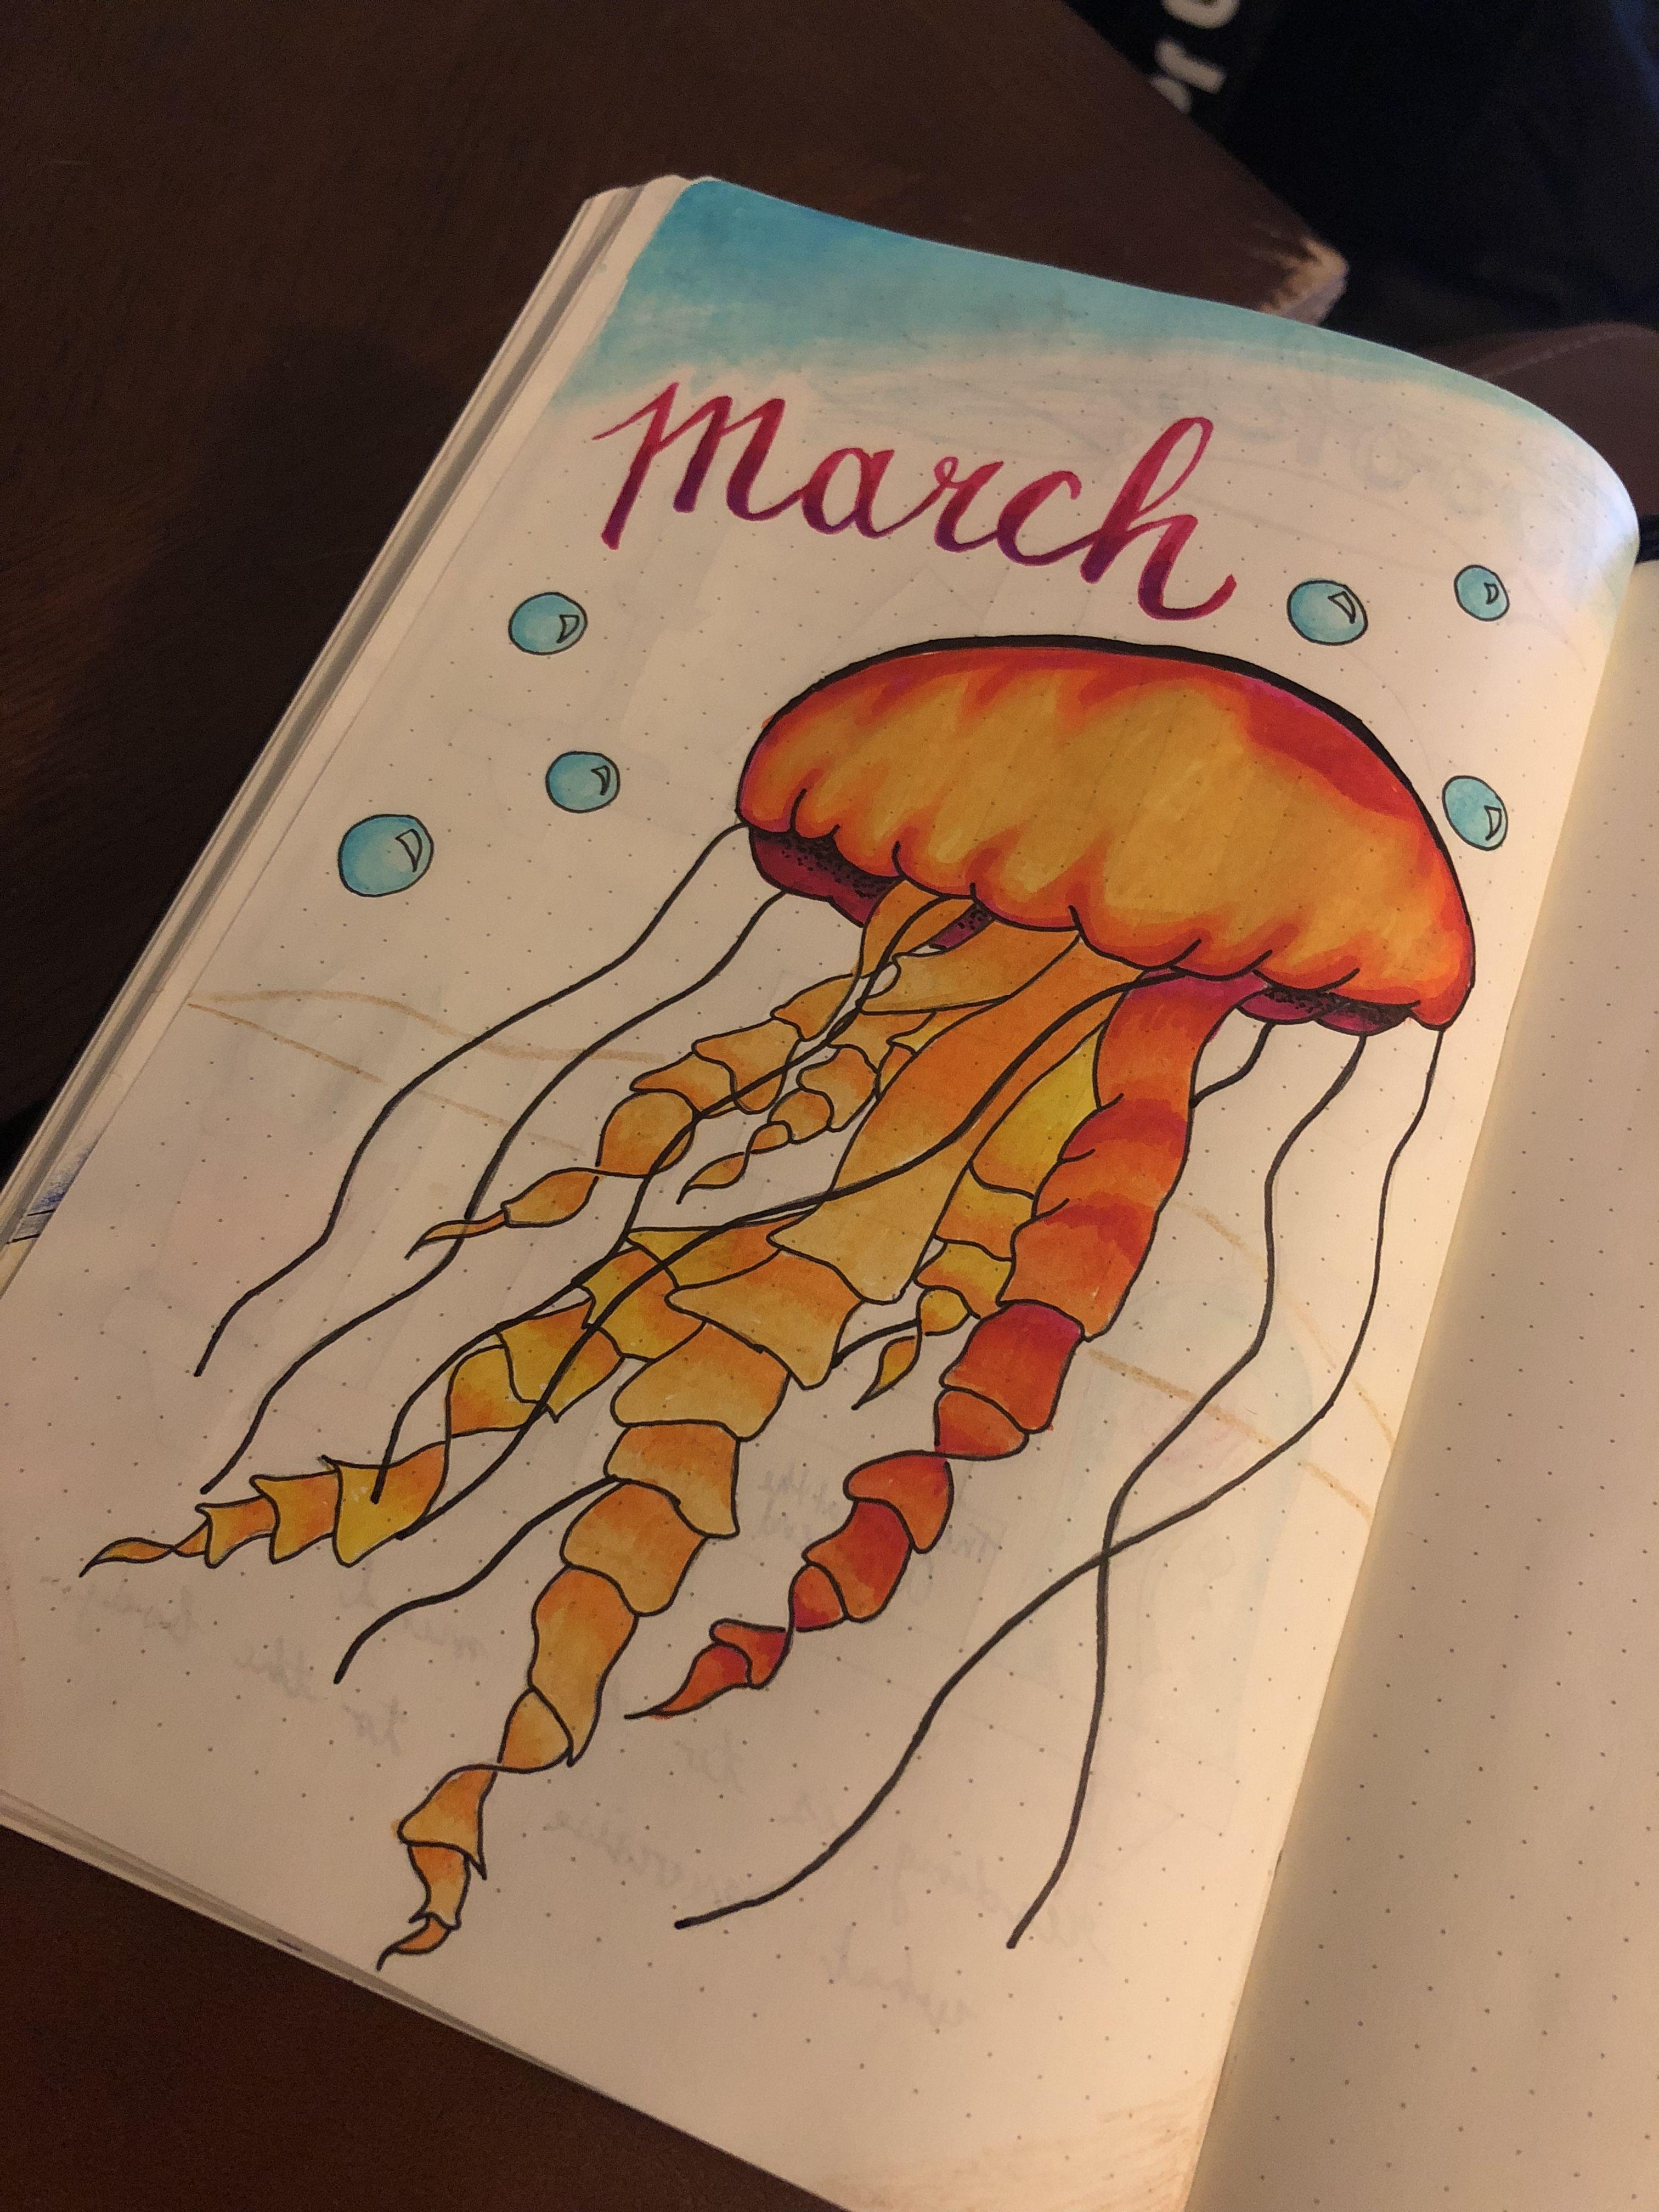 Imprimir Calendario 2019 Tumblr Más Caliente Sea theme to Start March Dibujo Of Imprimir Calendario 2019 Tumblr Recientes 1 10 Para Maestros En 2018 Pinterest